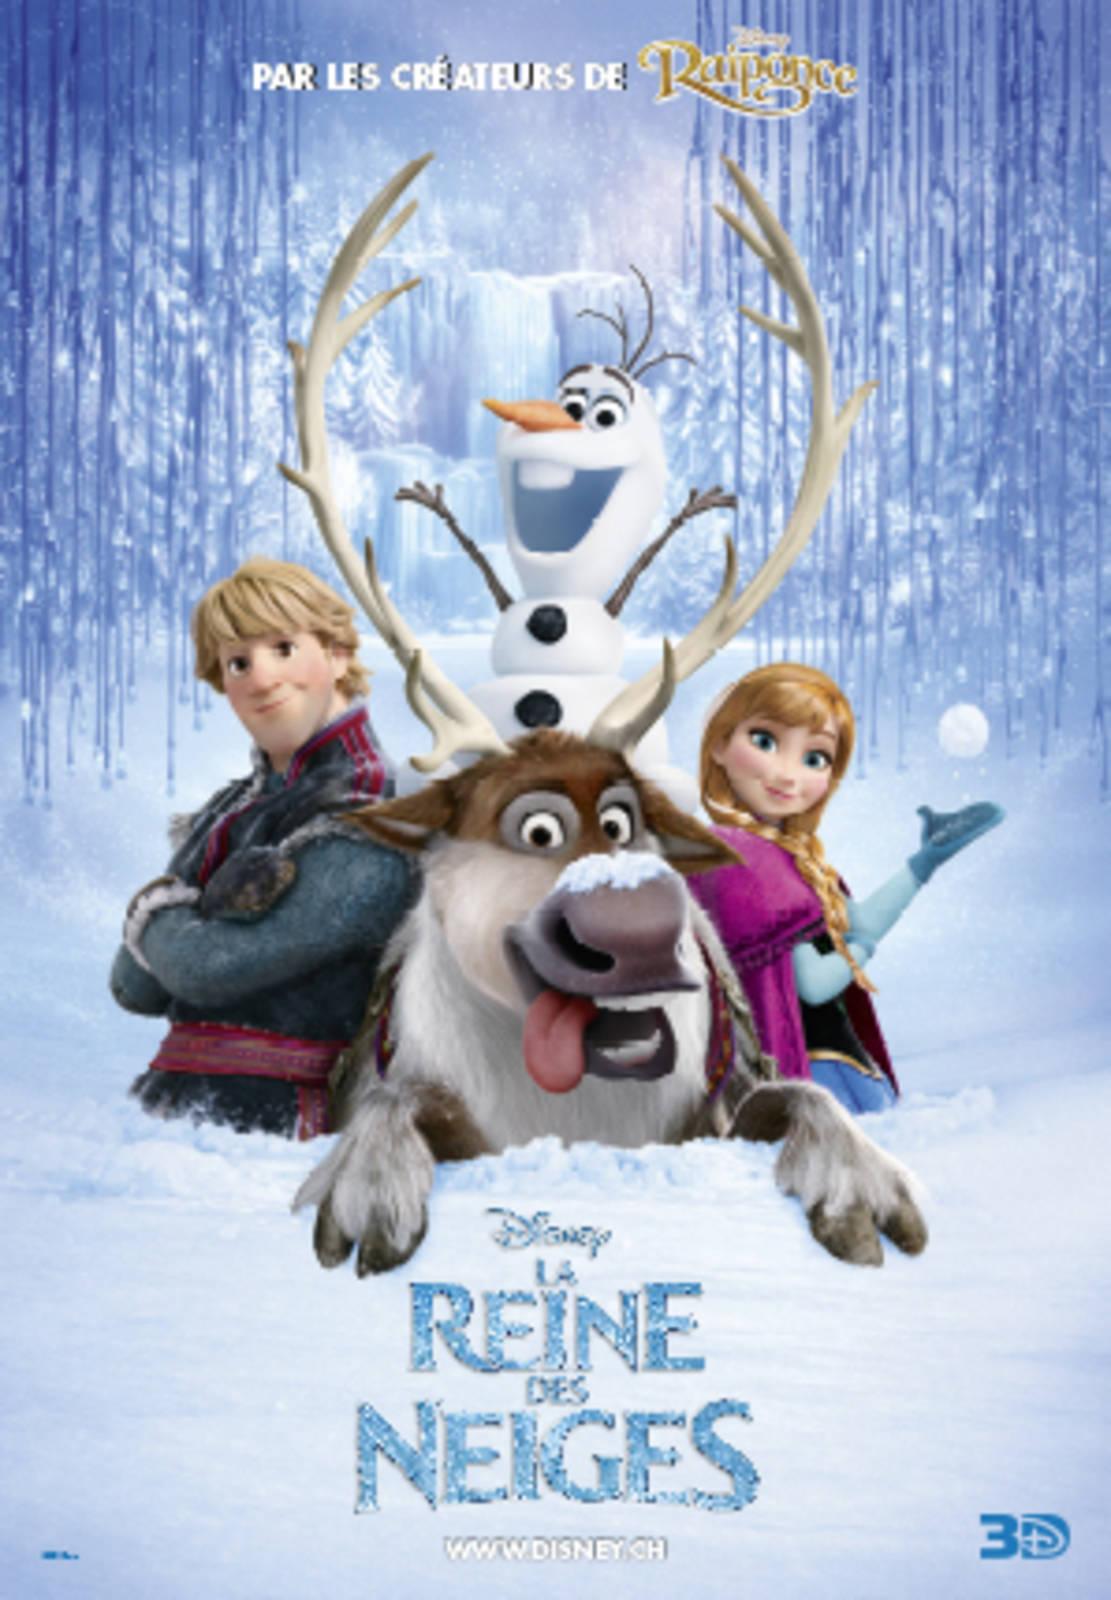 Film la reine des neiges cineman - Veilleuse la reine des neiges ...